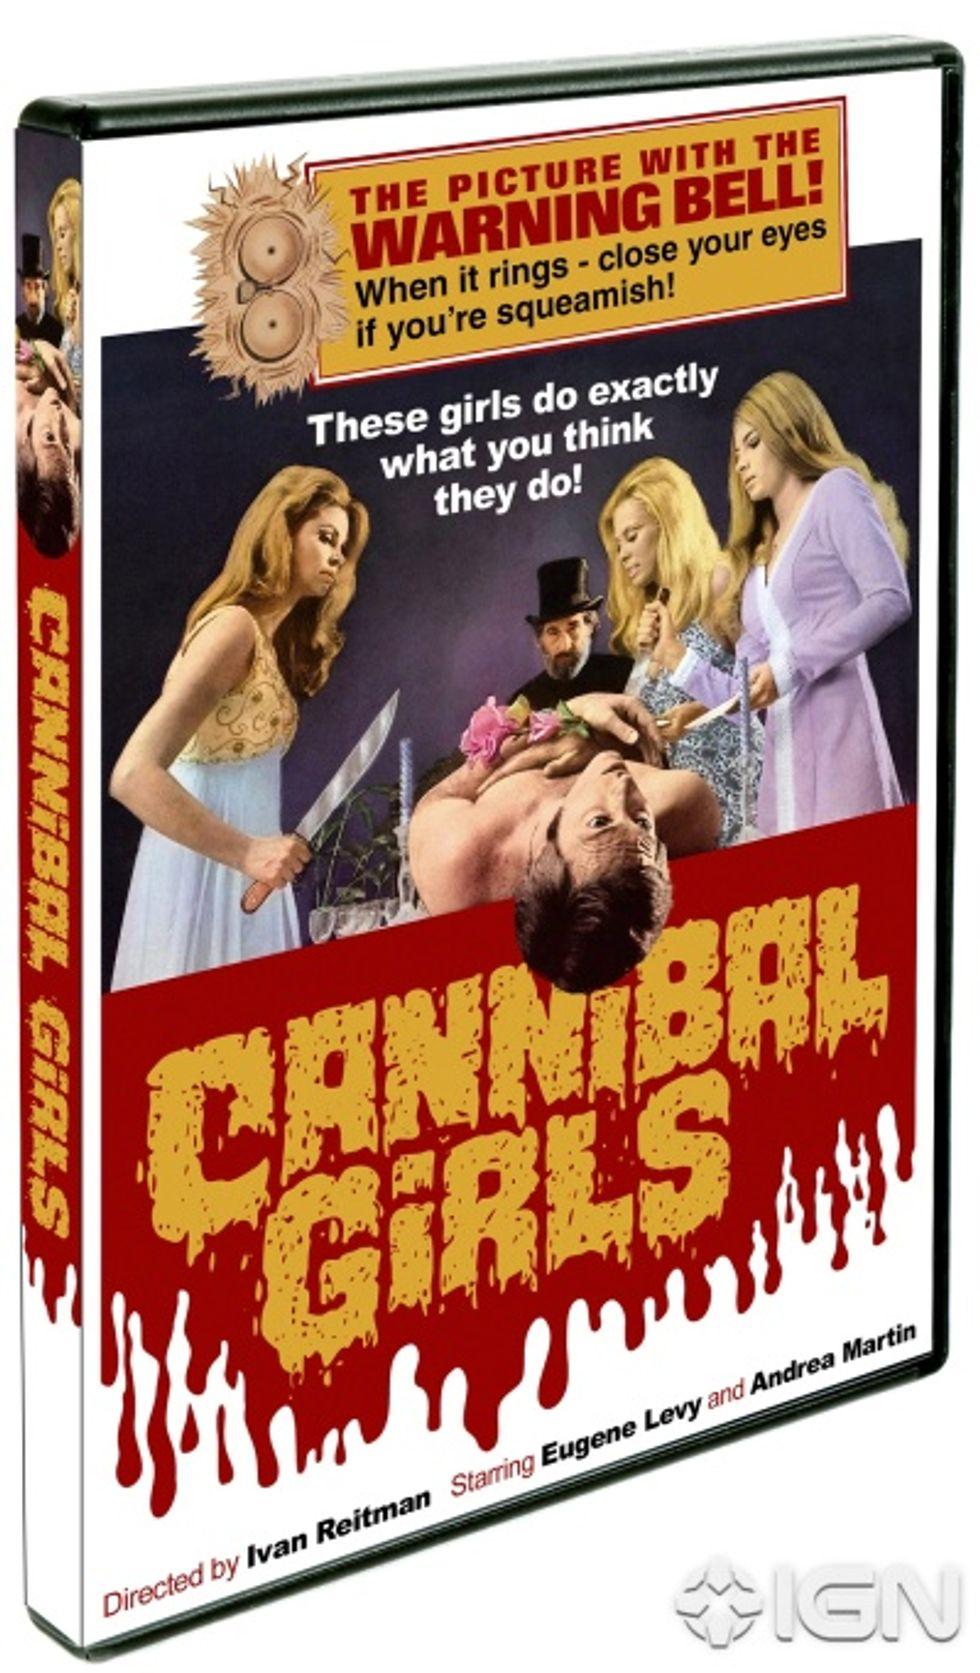 Cannibal Girls On DVD!